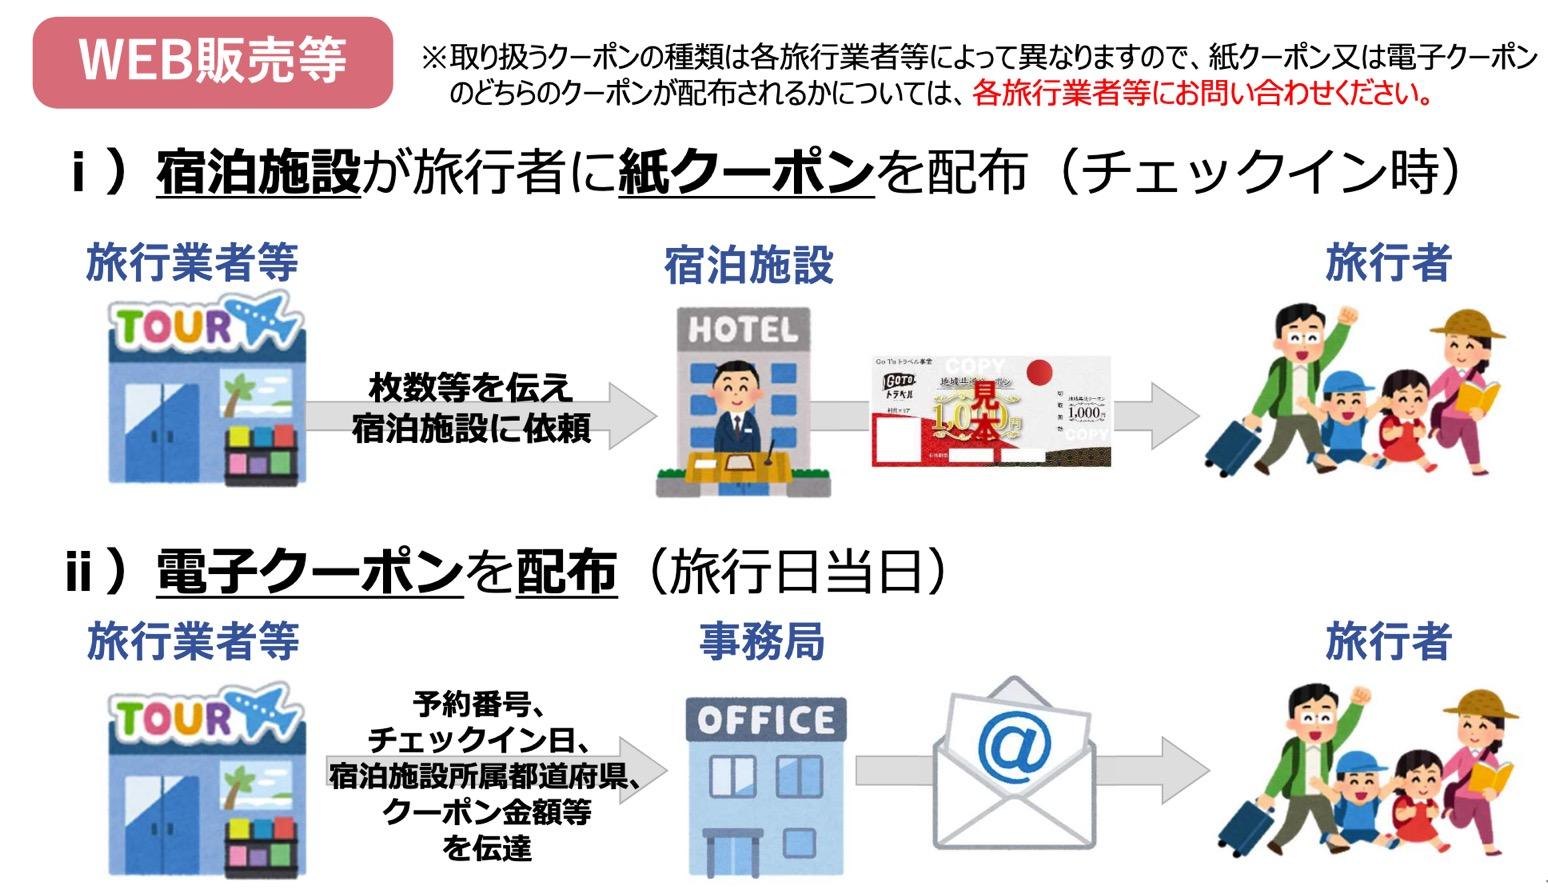 GoToトラベル「地域共通クーポン」:Web販売でのクーポン配布イメージ